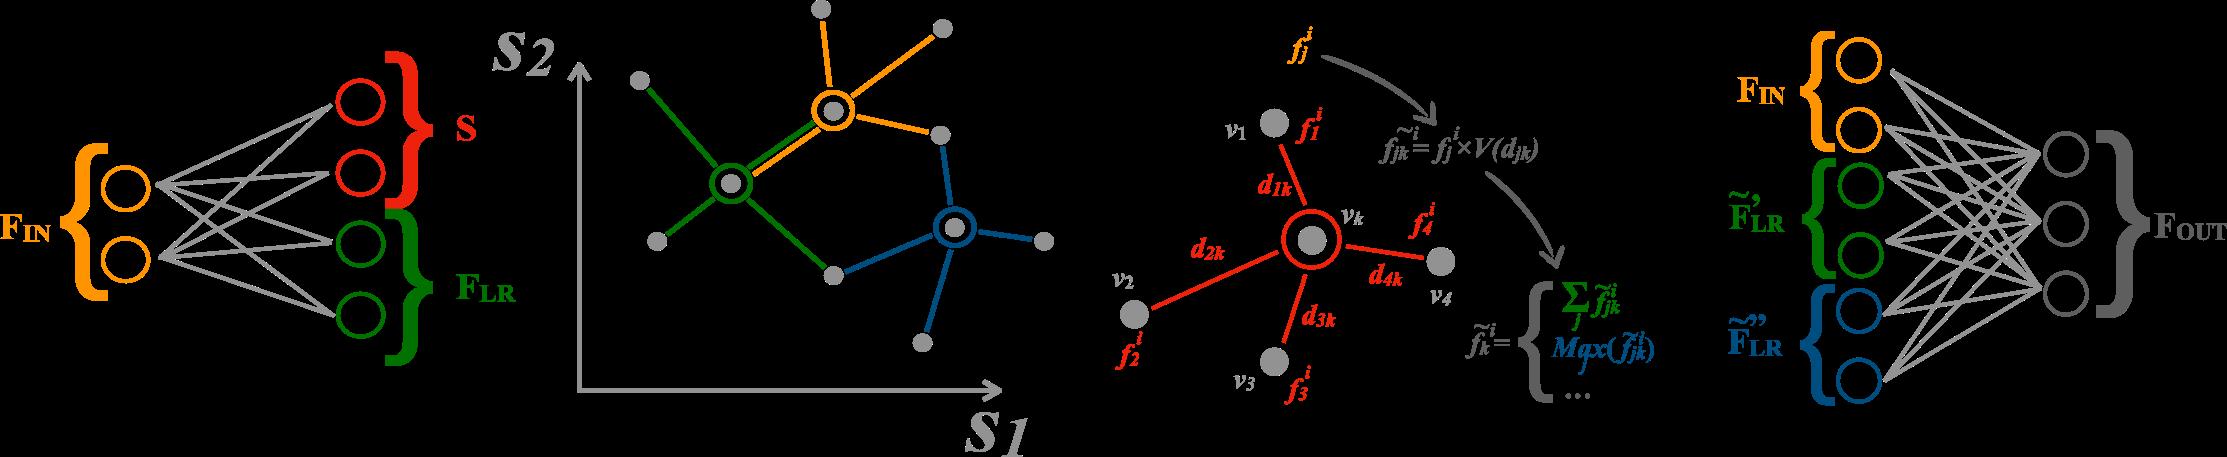 GravNet layer architecture